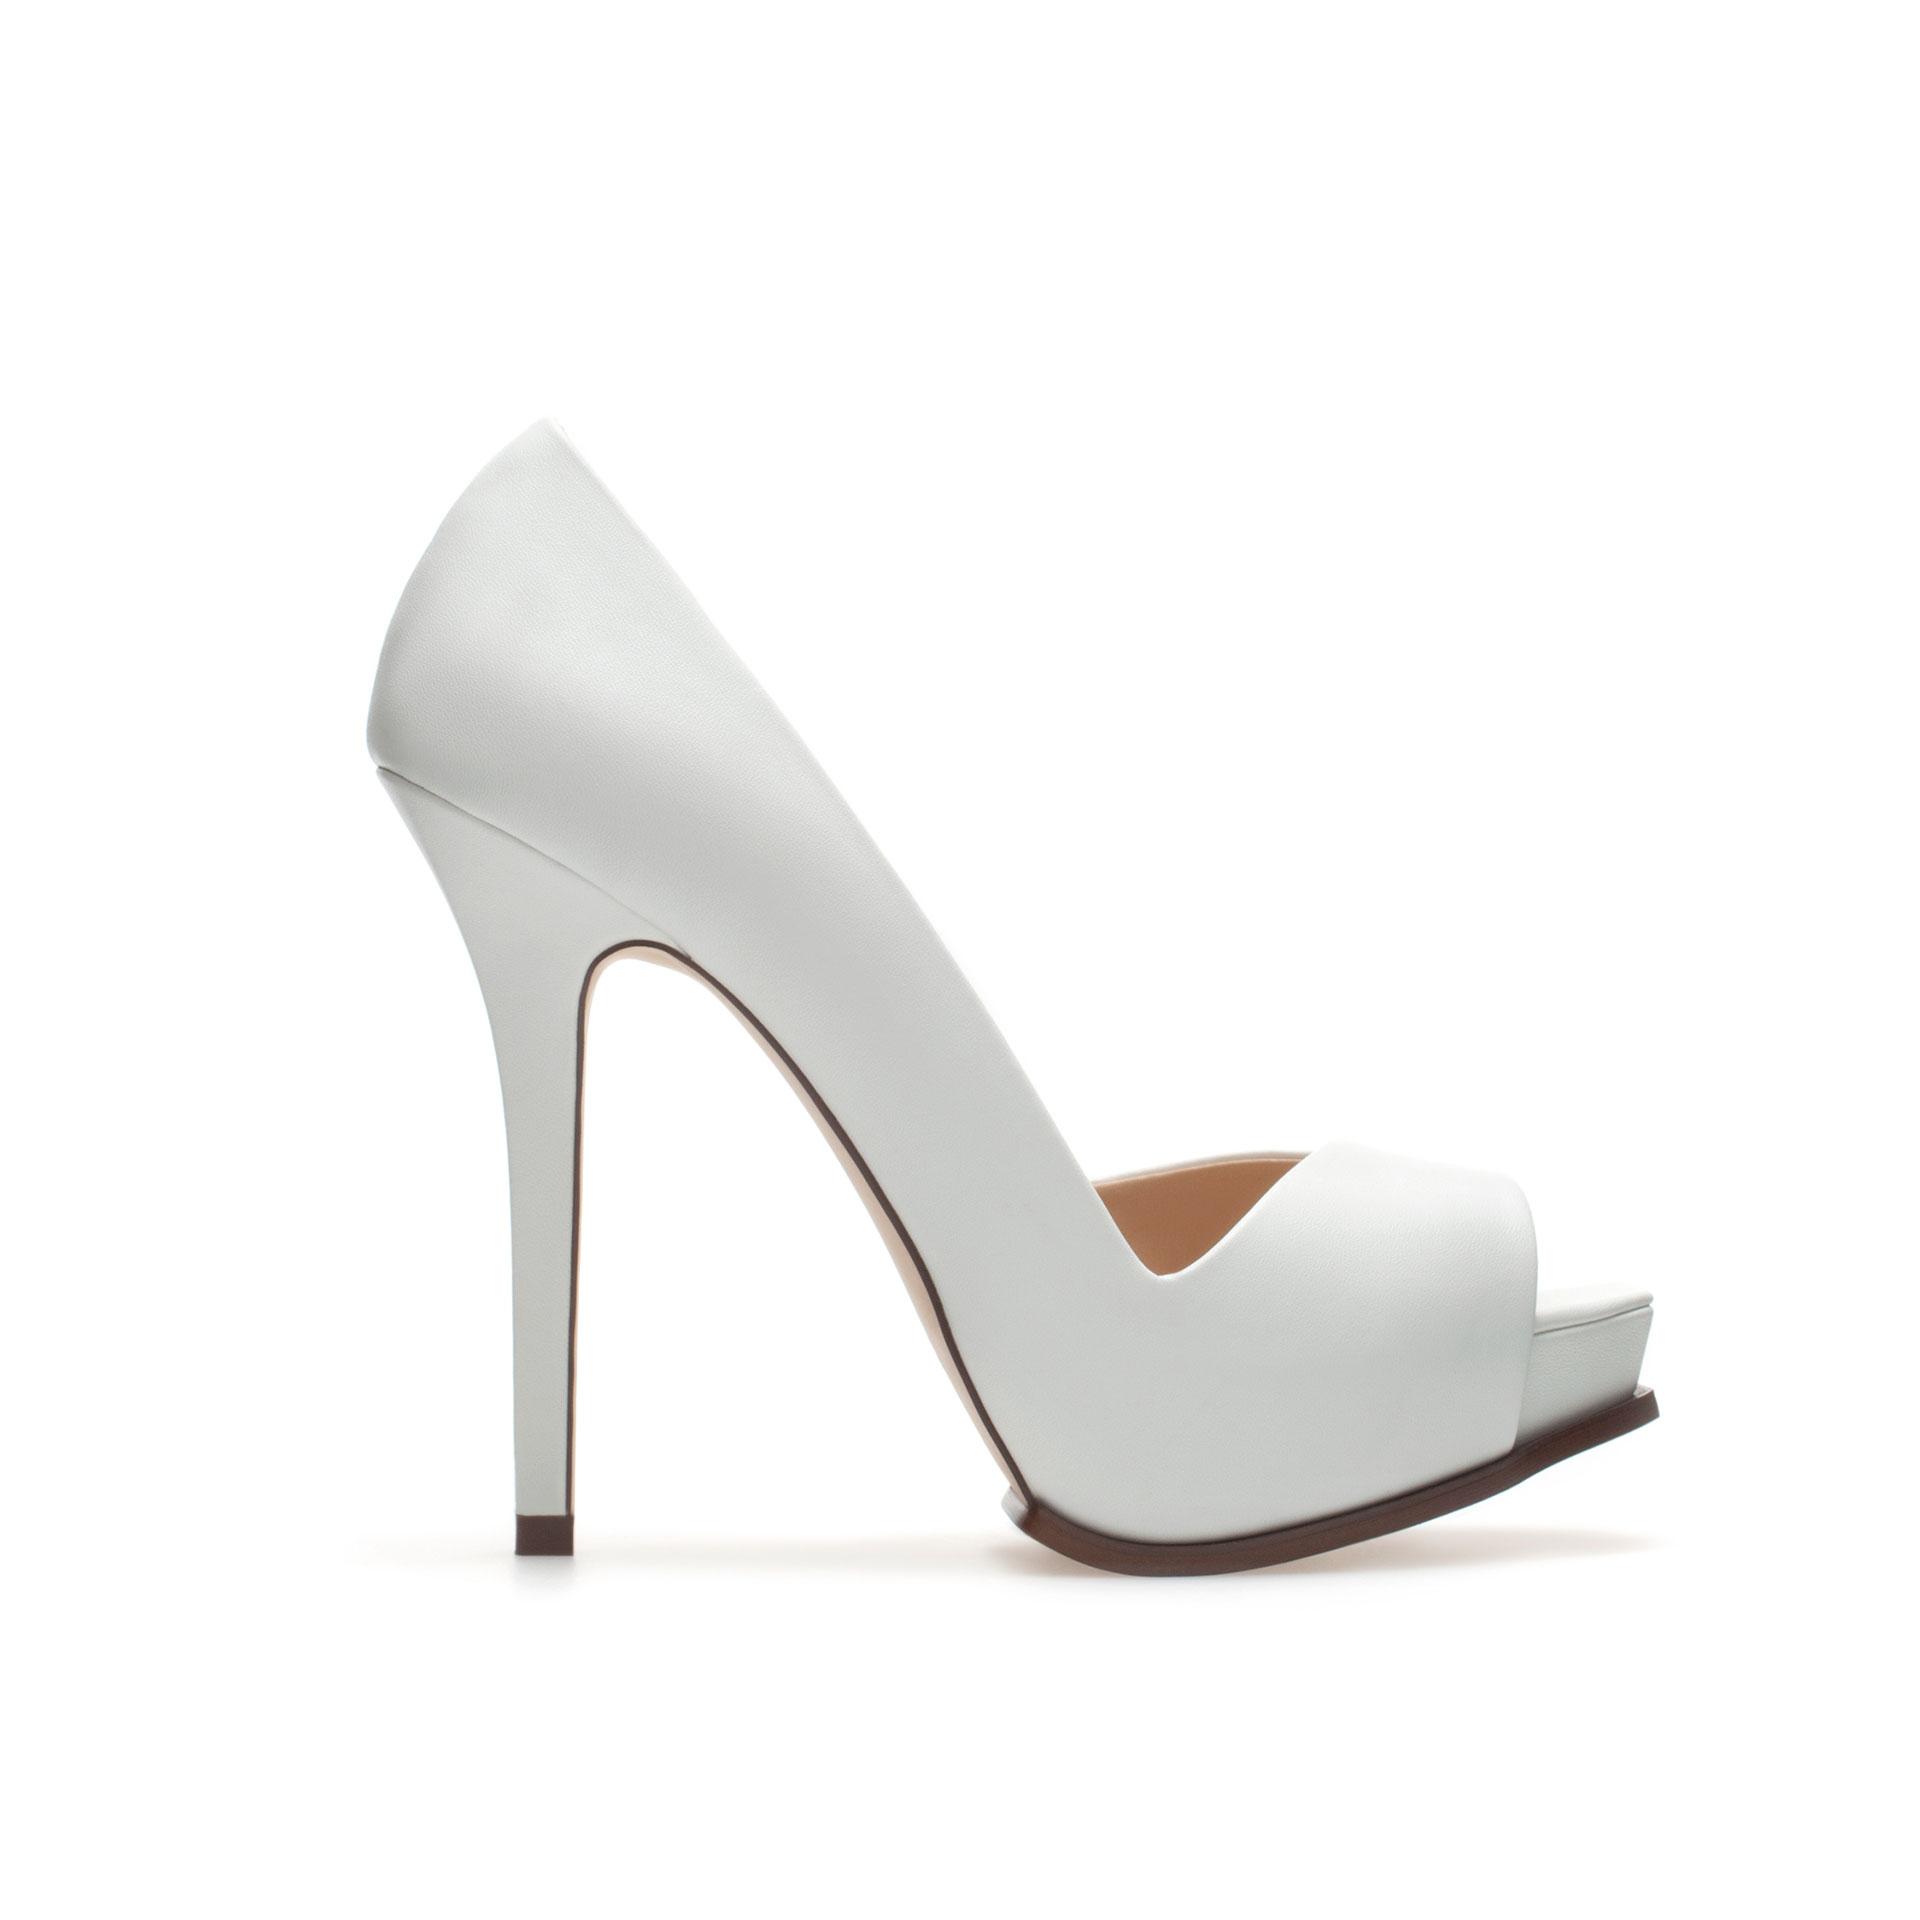 Badgley Mischka White Shoes | heels.com | Badgley Mischka White